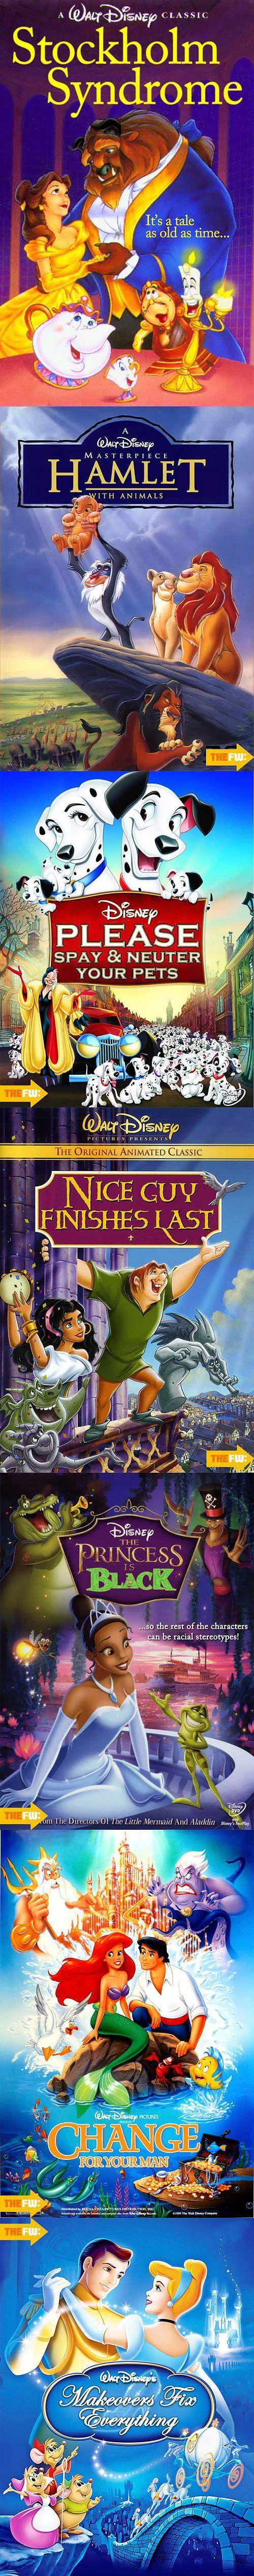 Alternate Disney film titles…